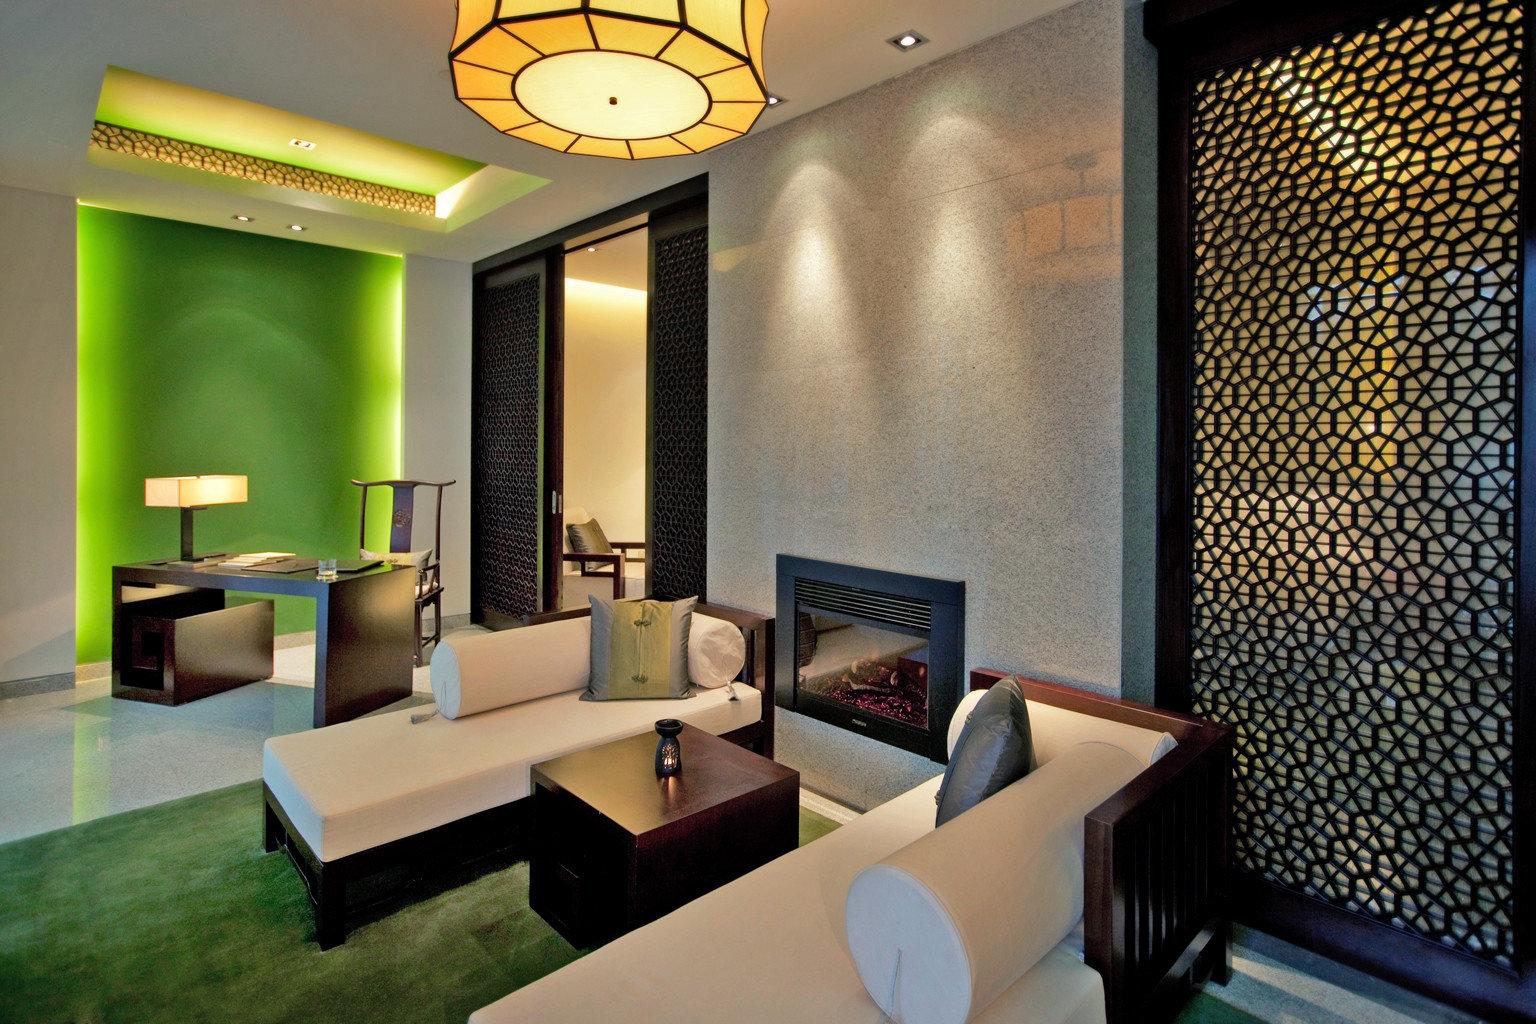 Elegant Lounge Luxury property Lobby condominium living room lighting Suite